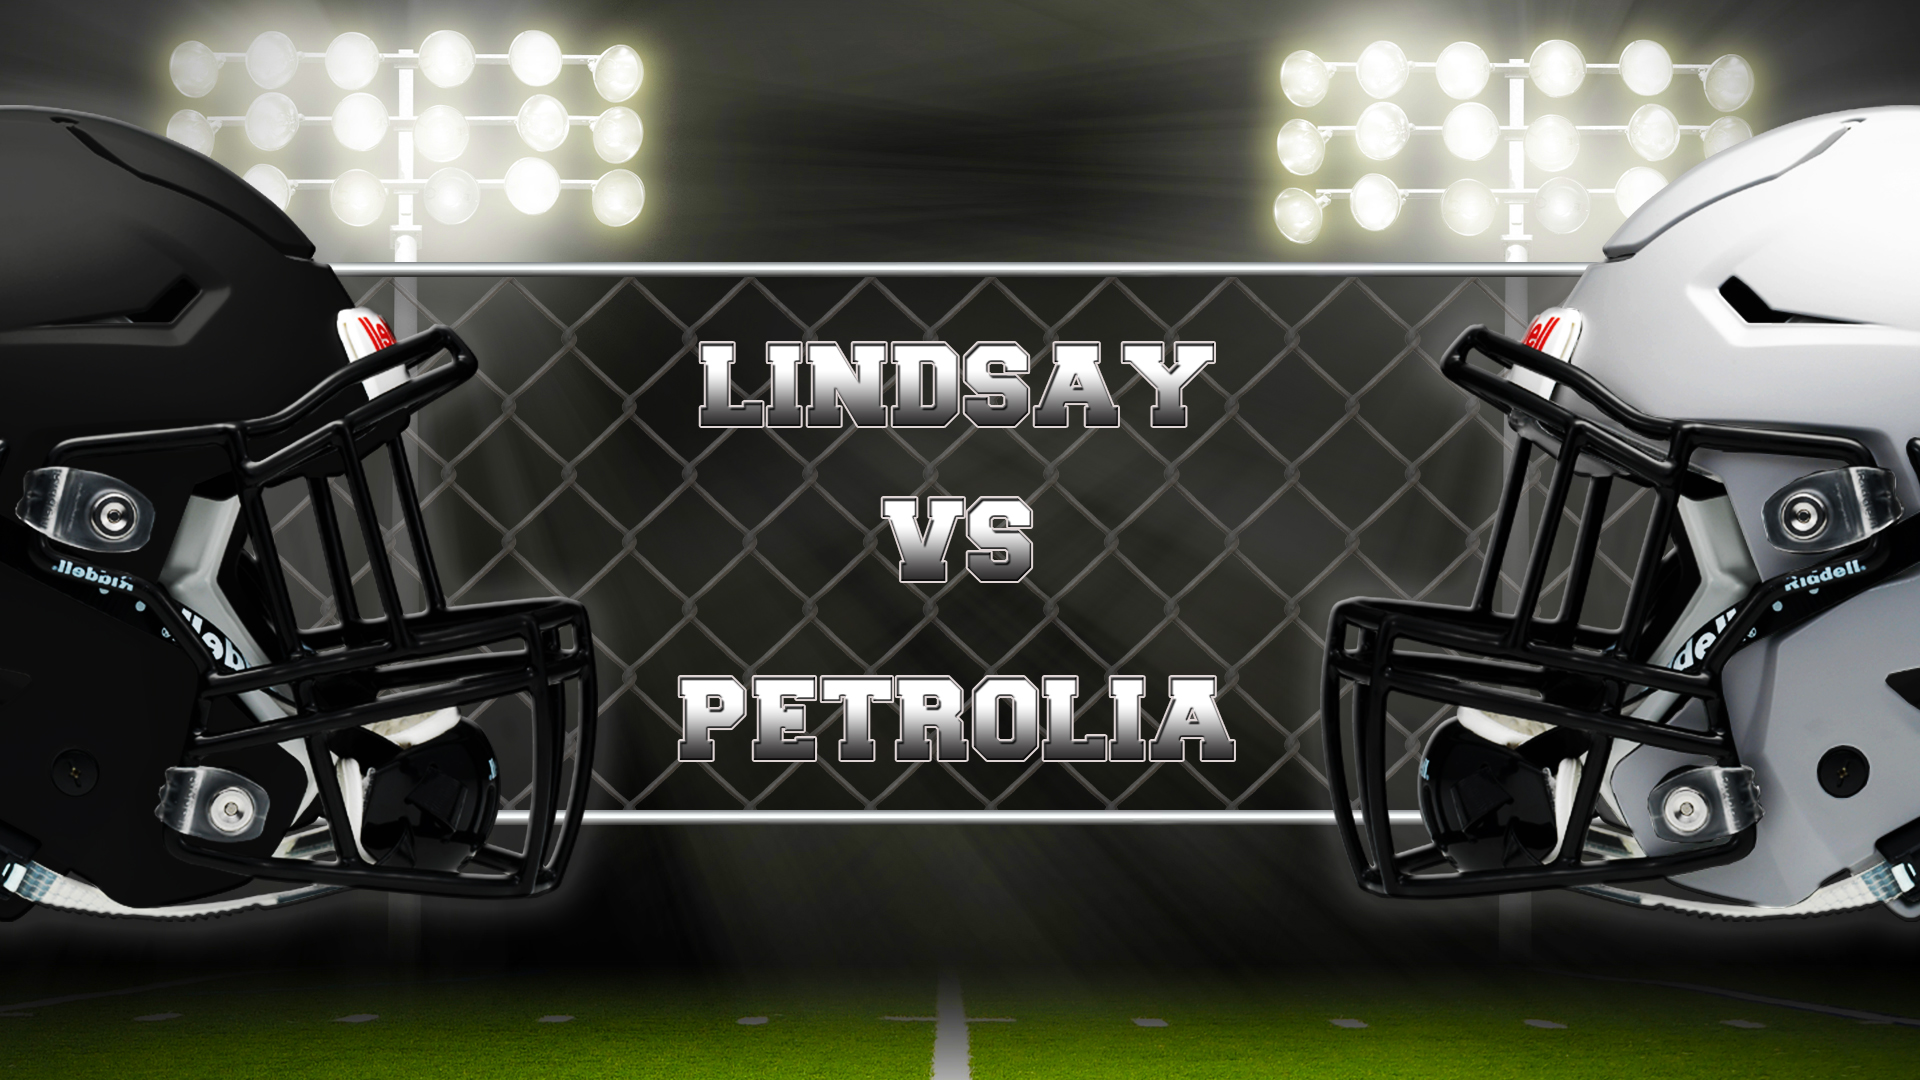 Lindsay vs Petrolia_1473438723166.jpg